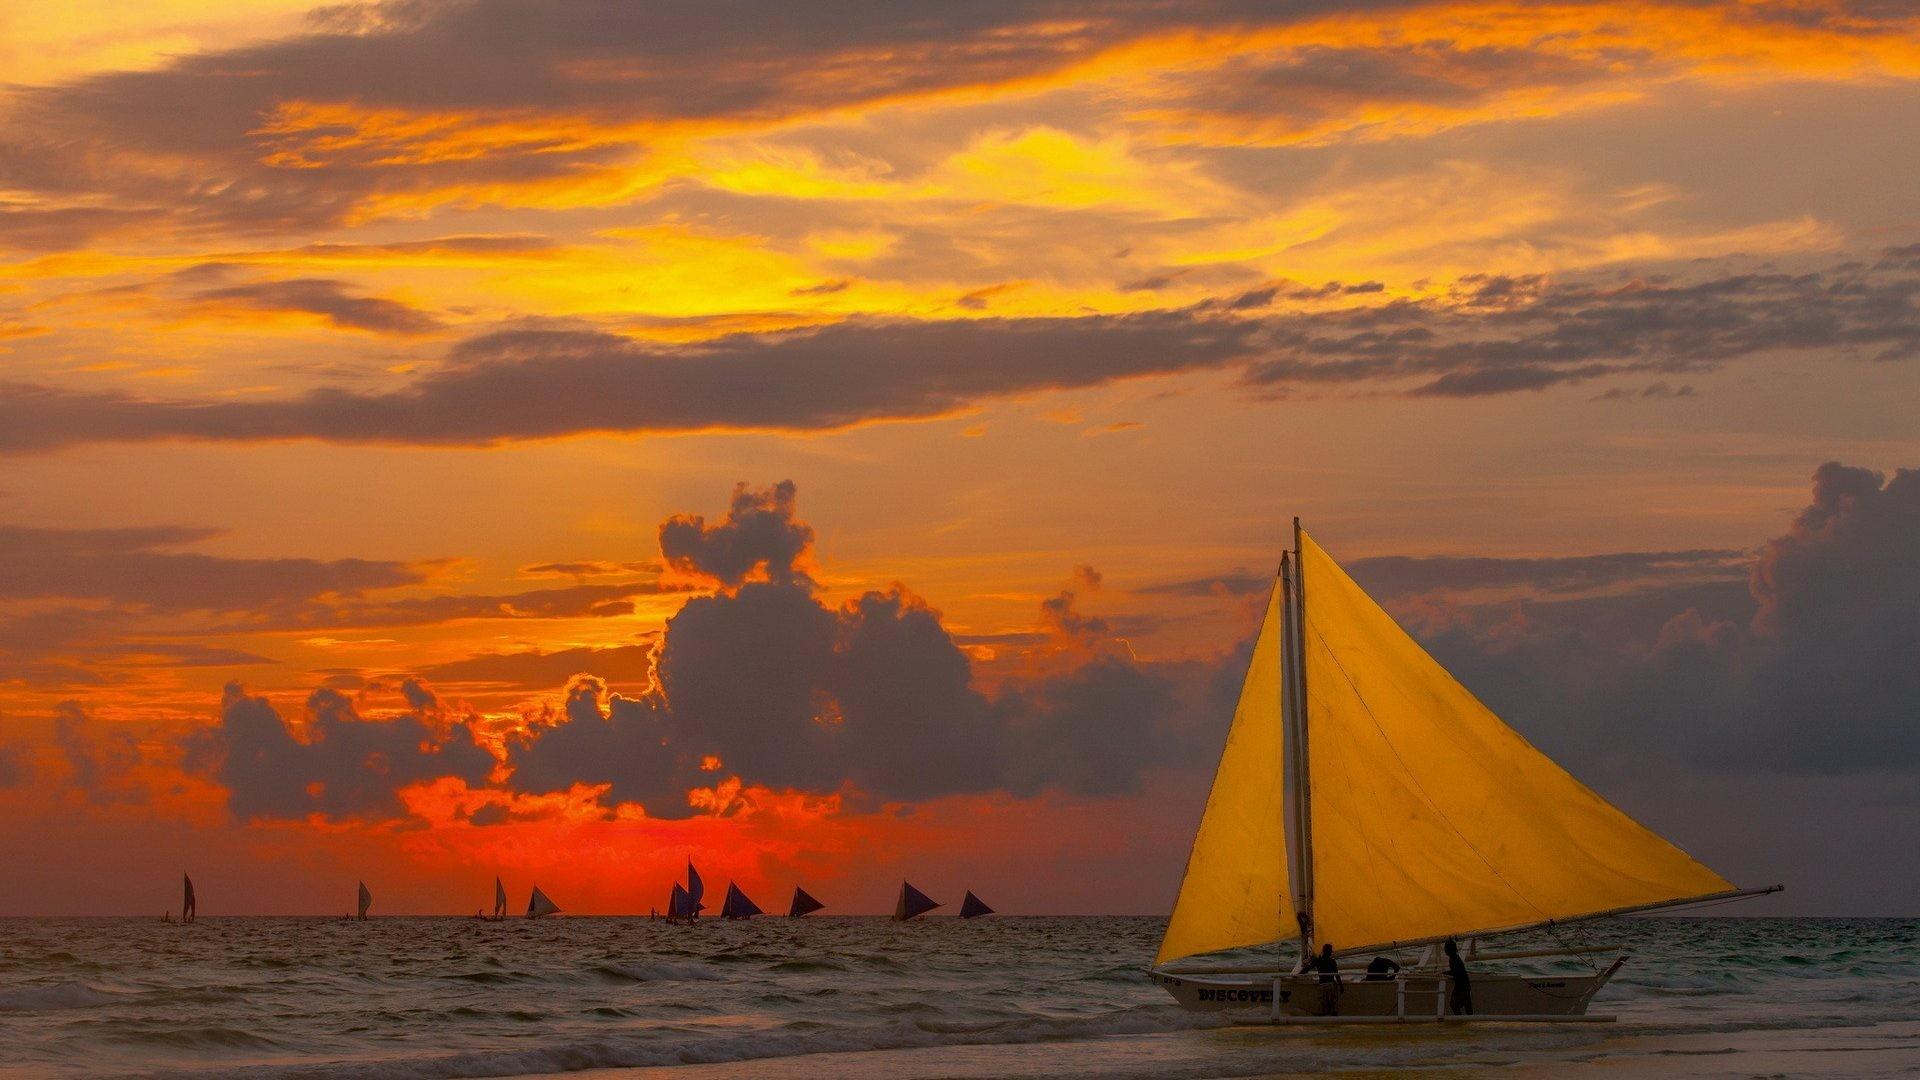 Ocean Tag – Sail Sailing Sunset Sailboats Boat Ocean Wallpapers For  Computer for HD 16: